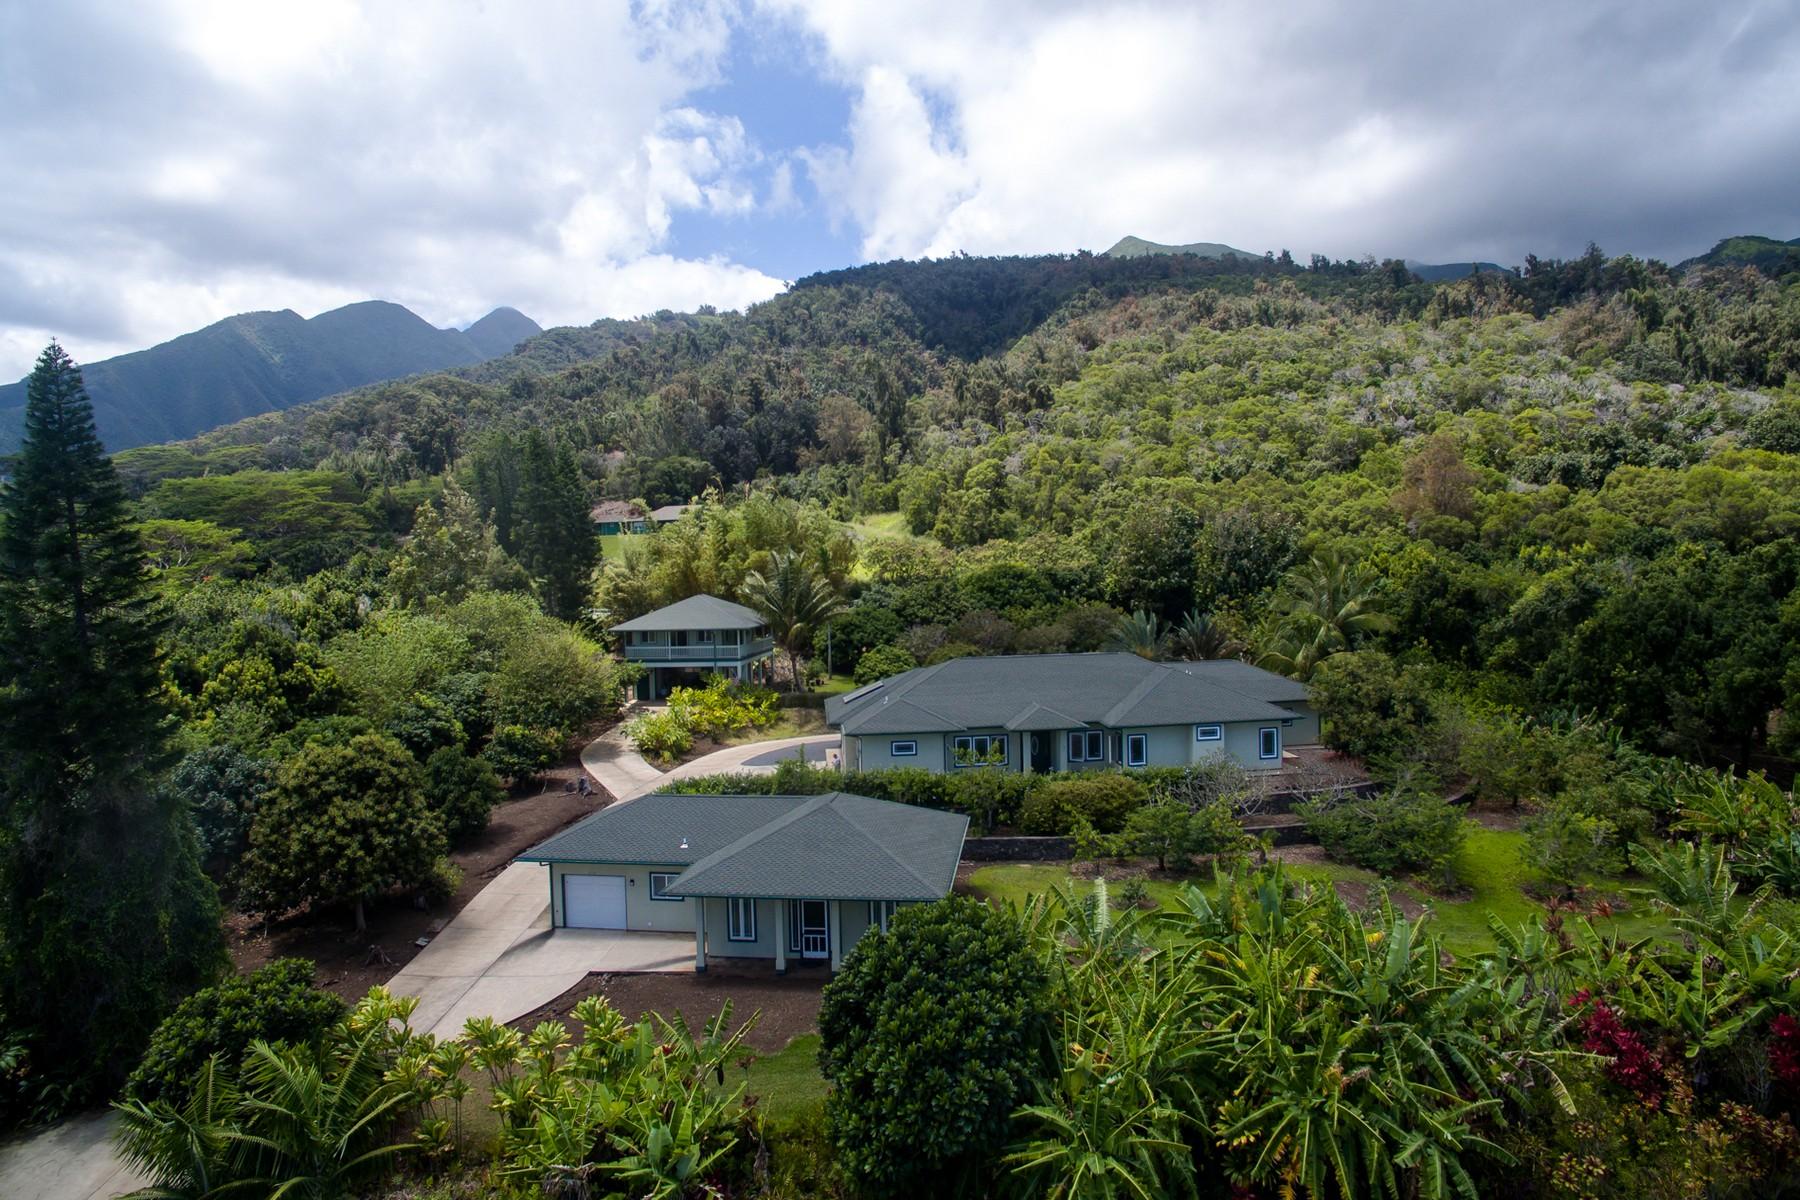 Nhà ở một gia đình vì Bán tại Transcendent 2 Acre Wailuku Country Estate Compound 2392 Kamaile Street, 152 Wailuku, Hawaii, 96793 Hoa Kỳ